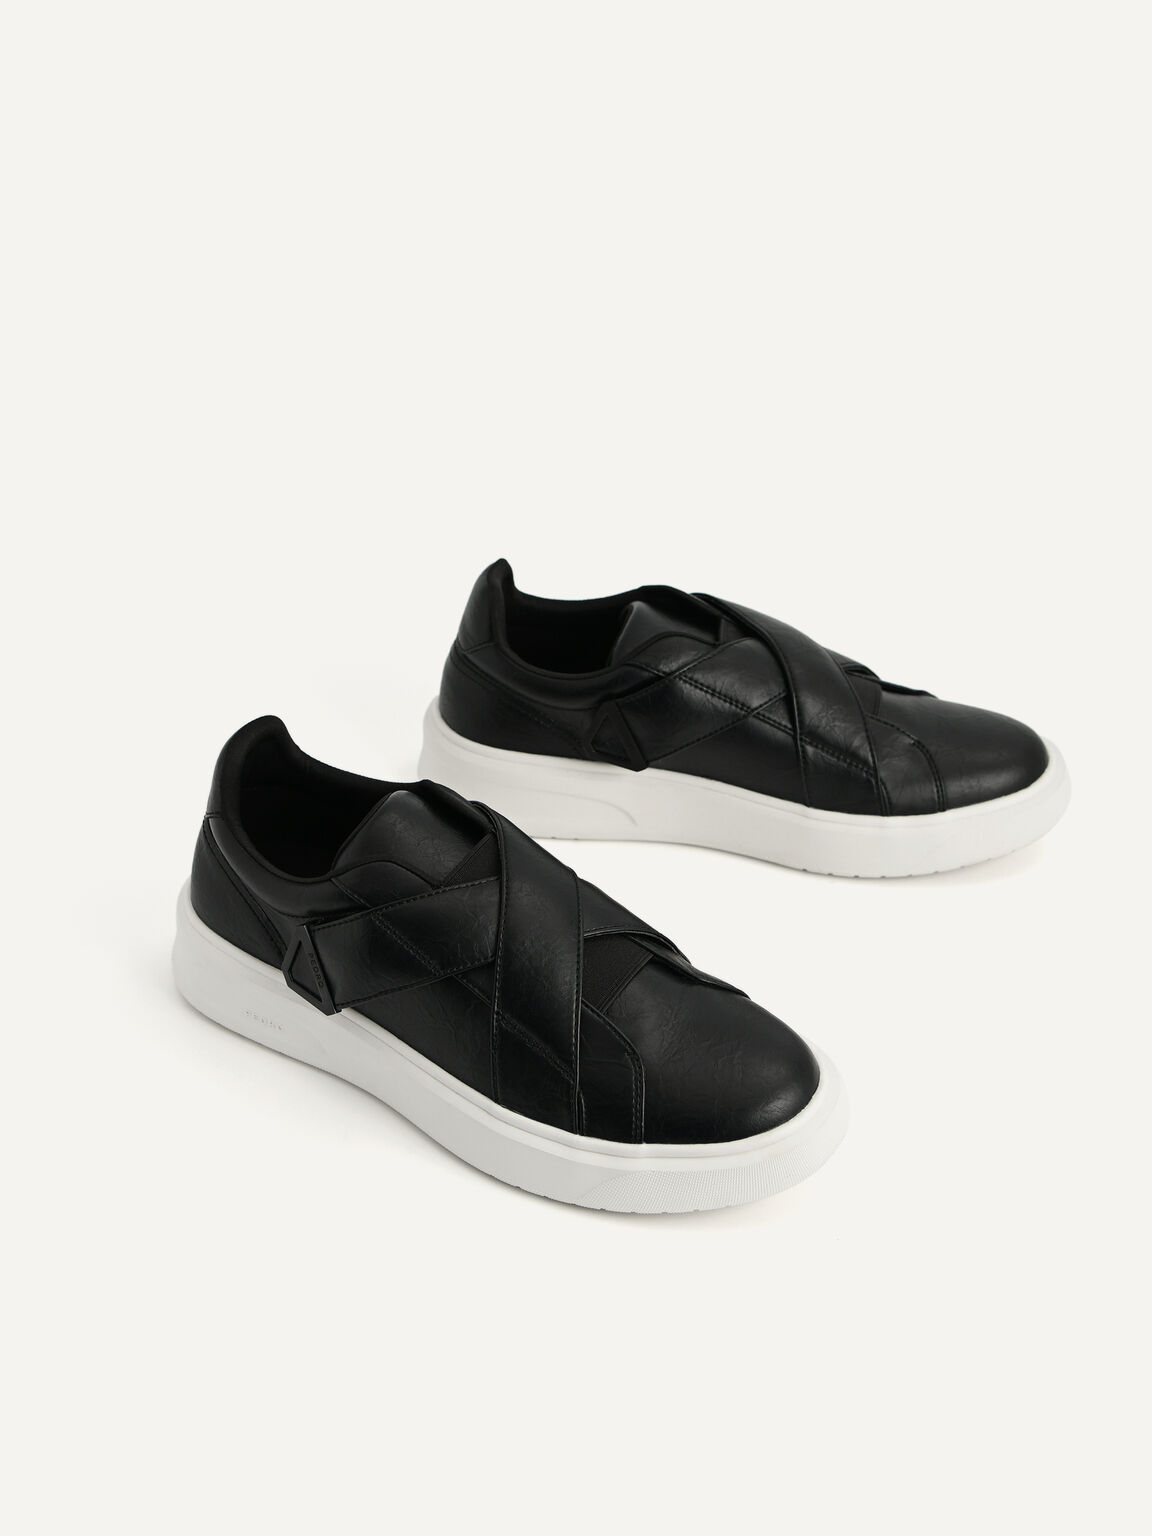 Cloudtrail Sneakers, Black, hi-res